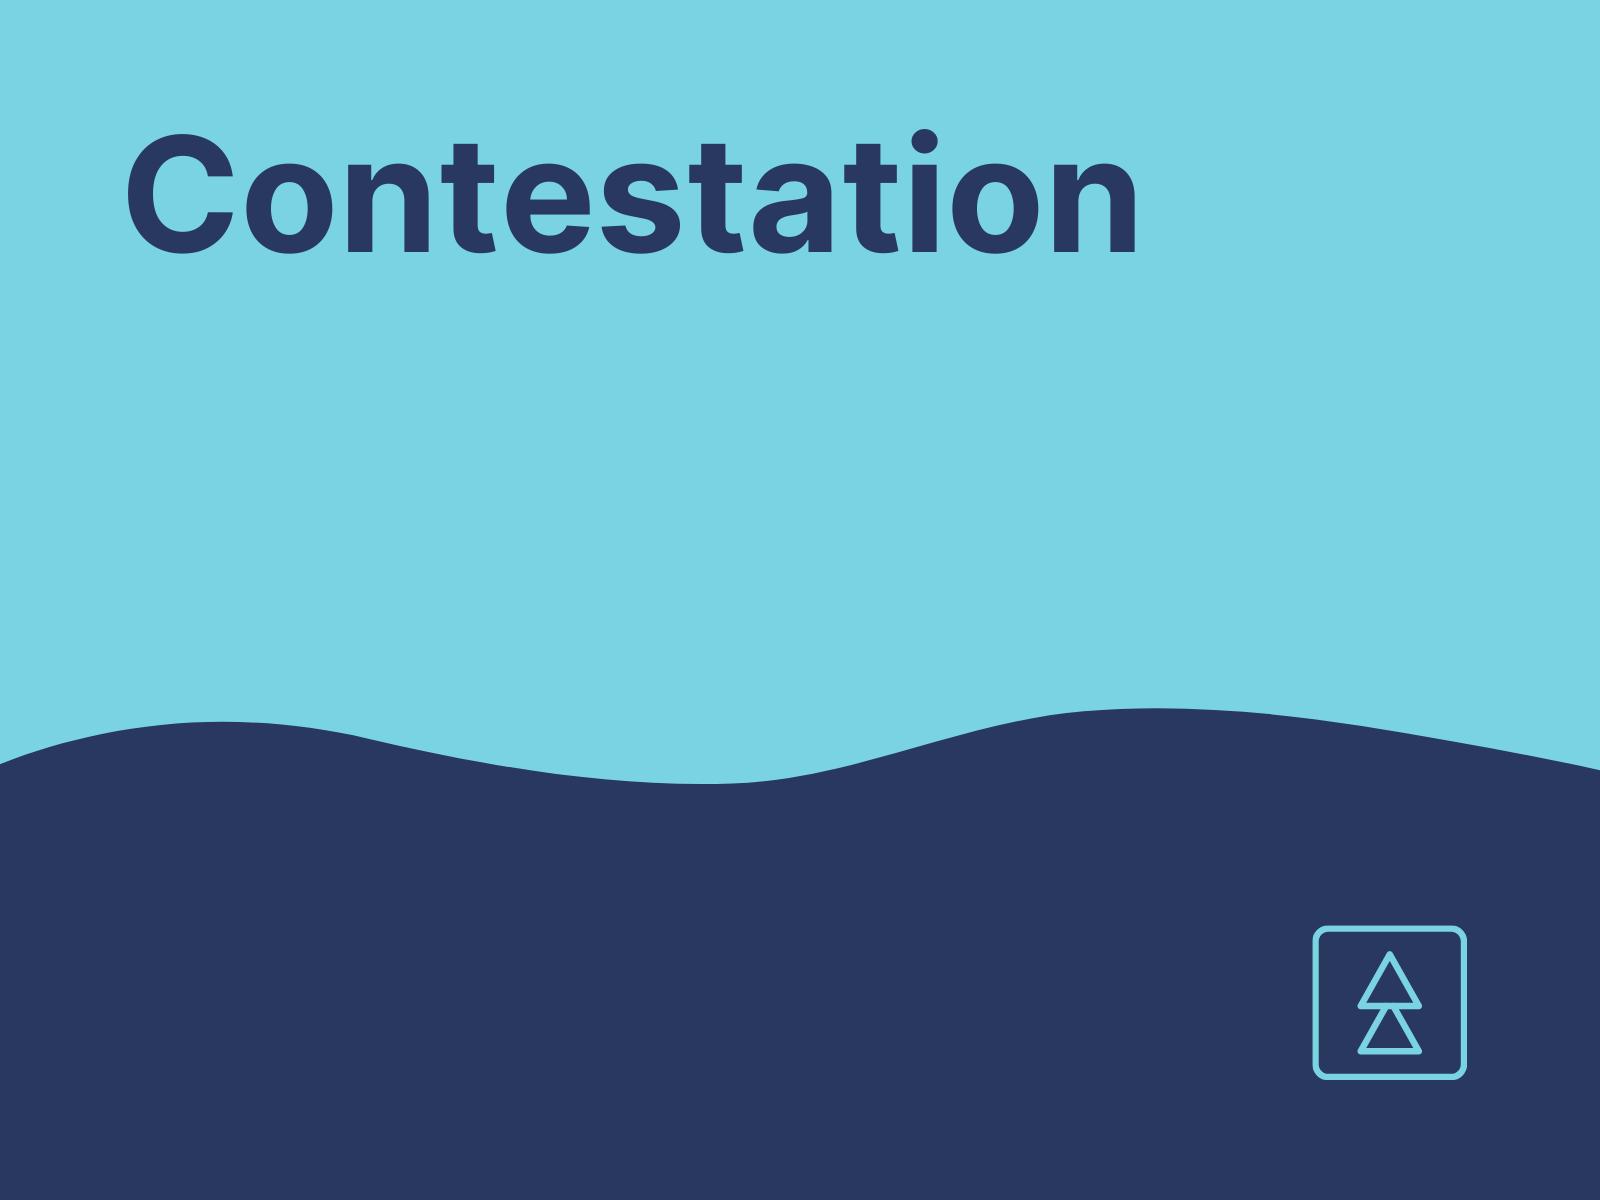 Contestation